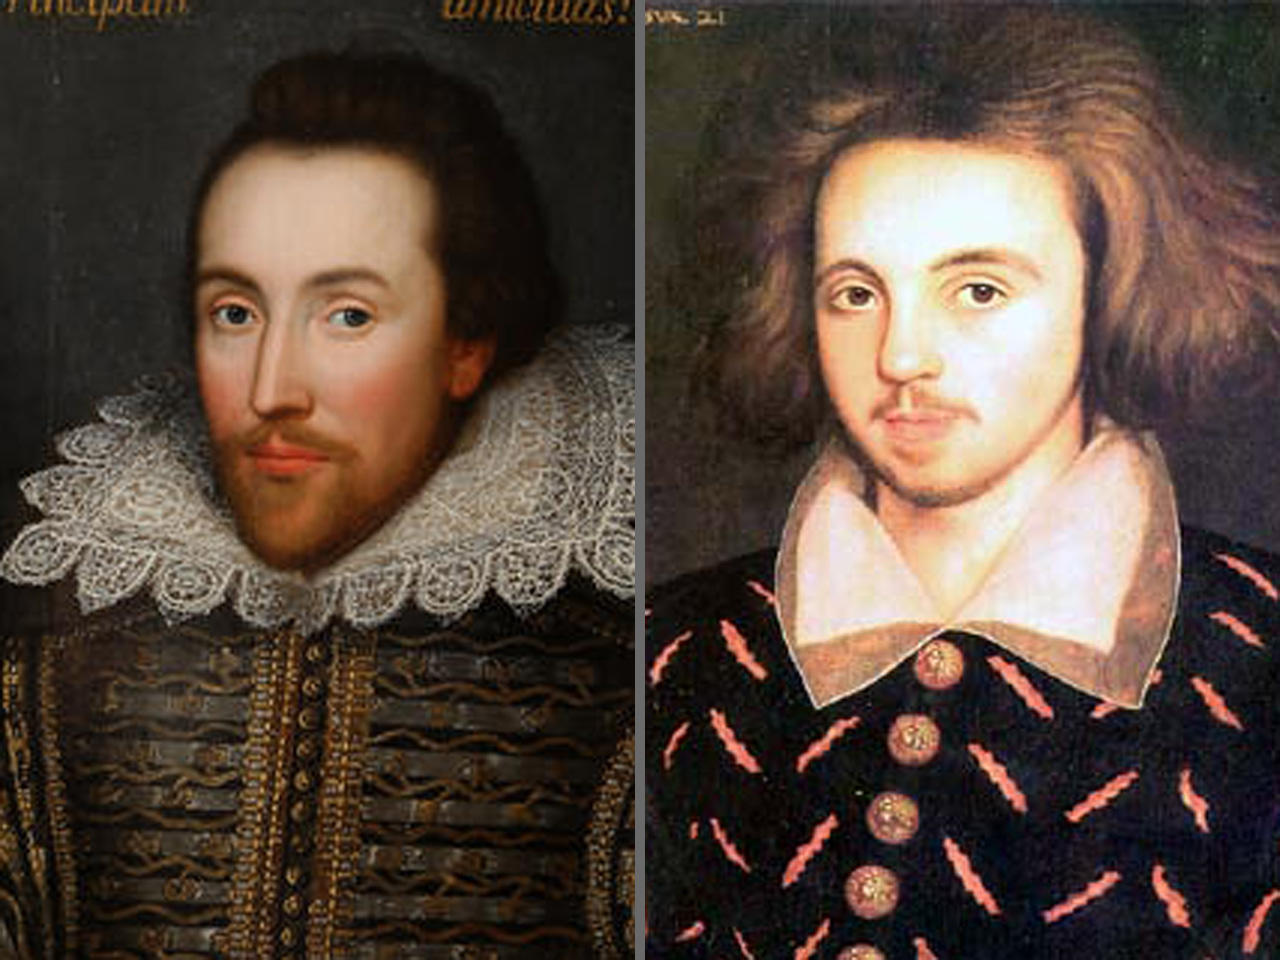 Marlovian theory of Shakespeare authorship